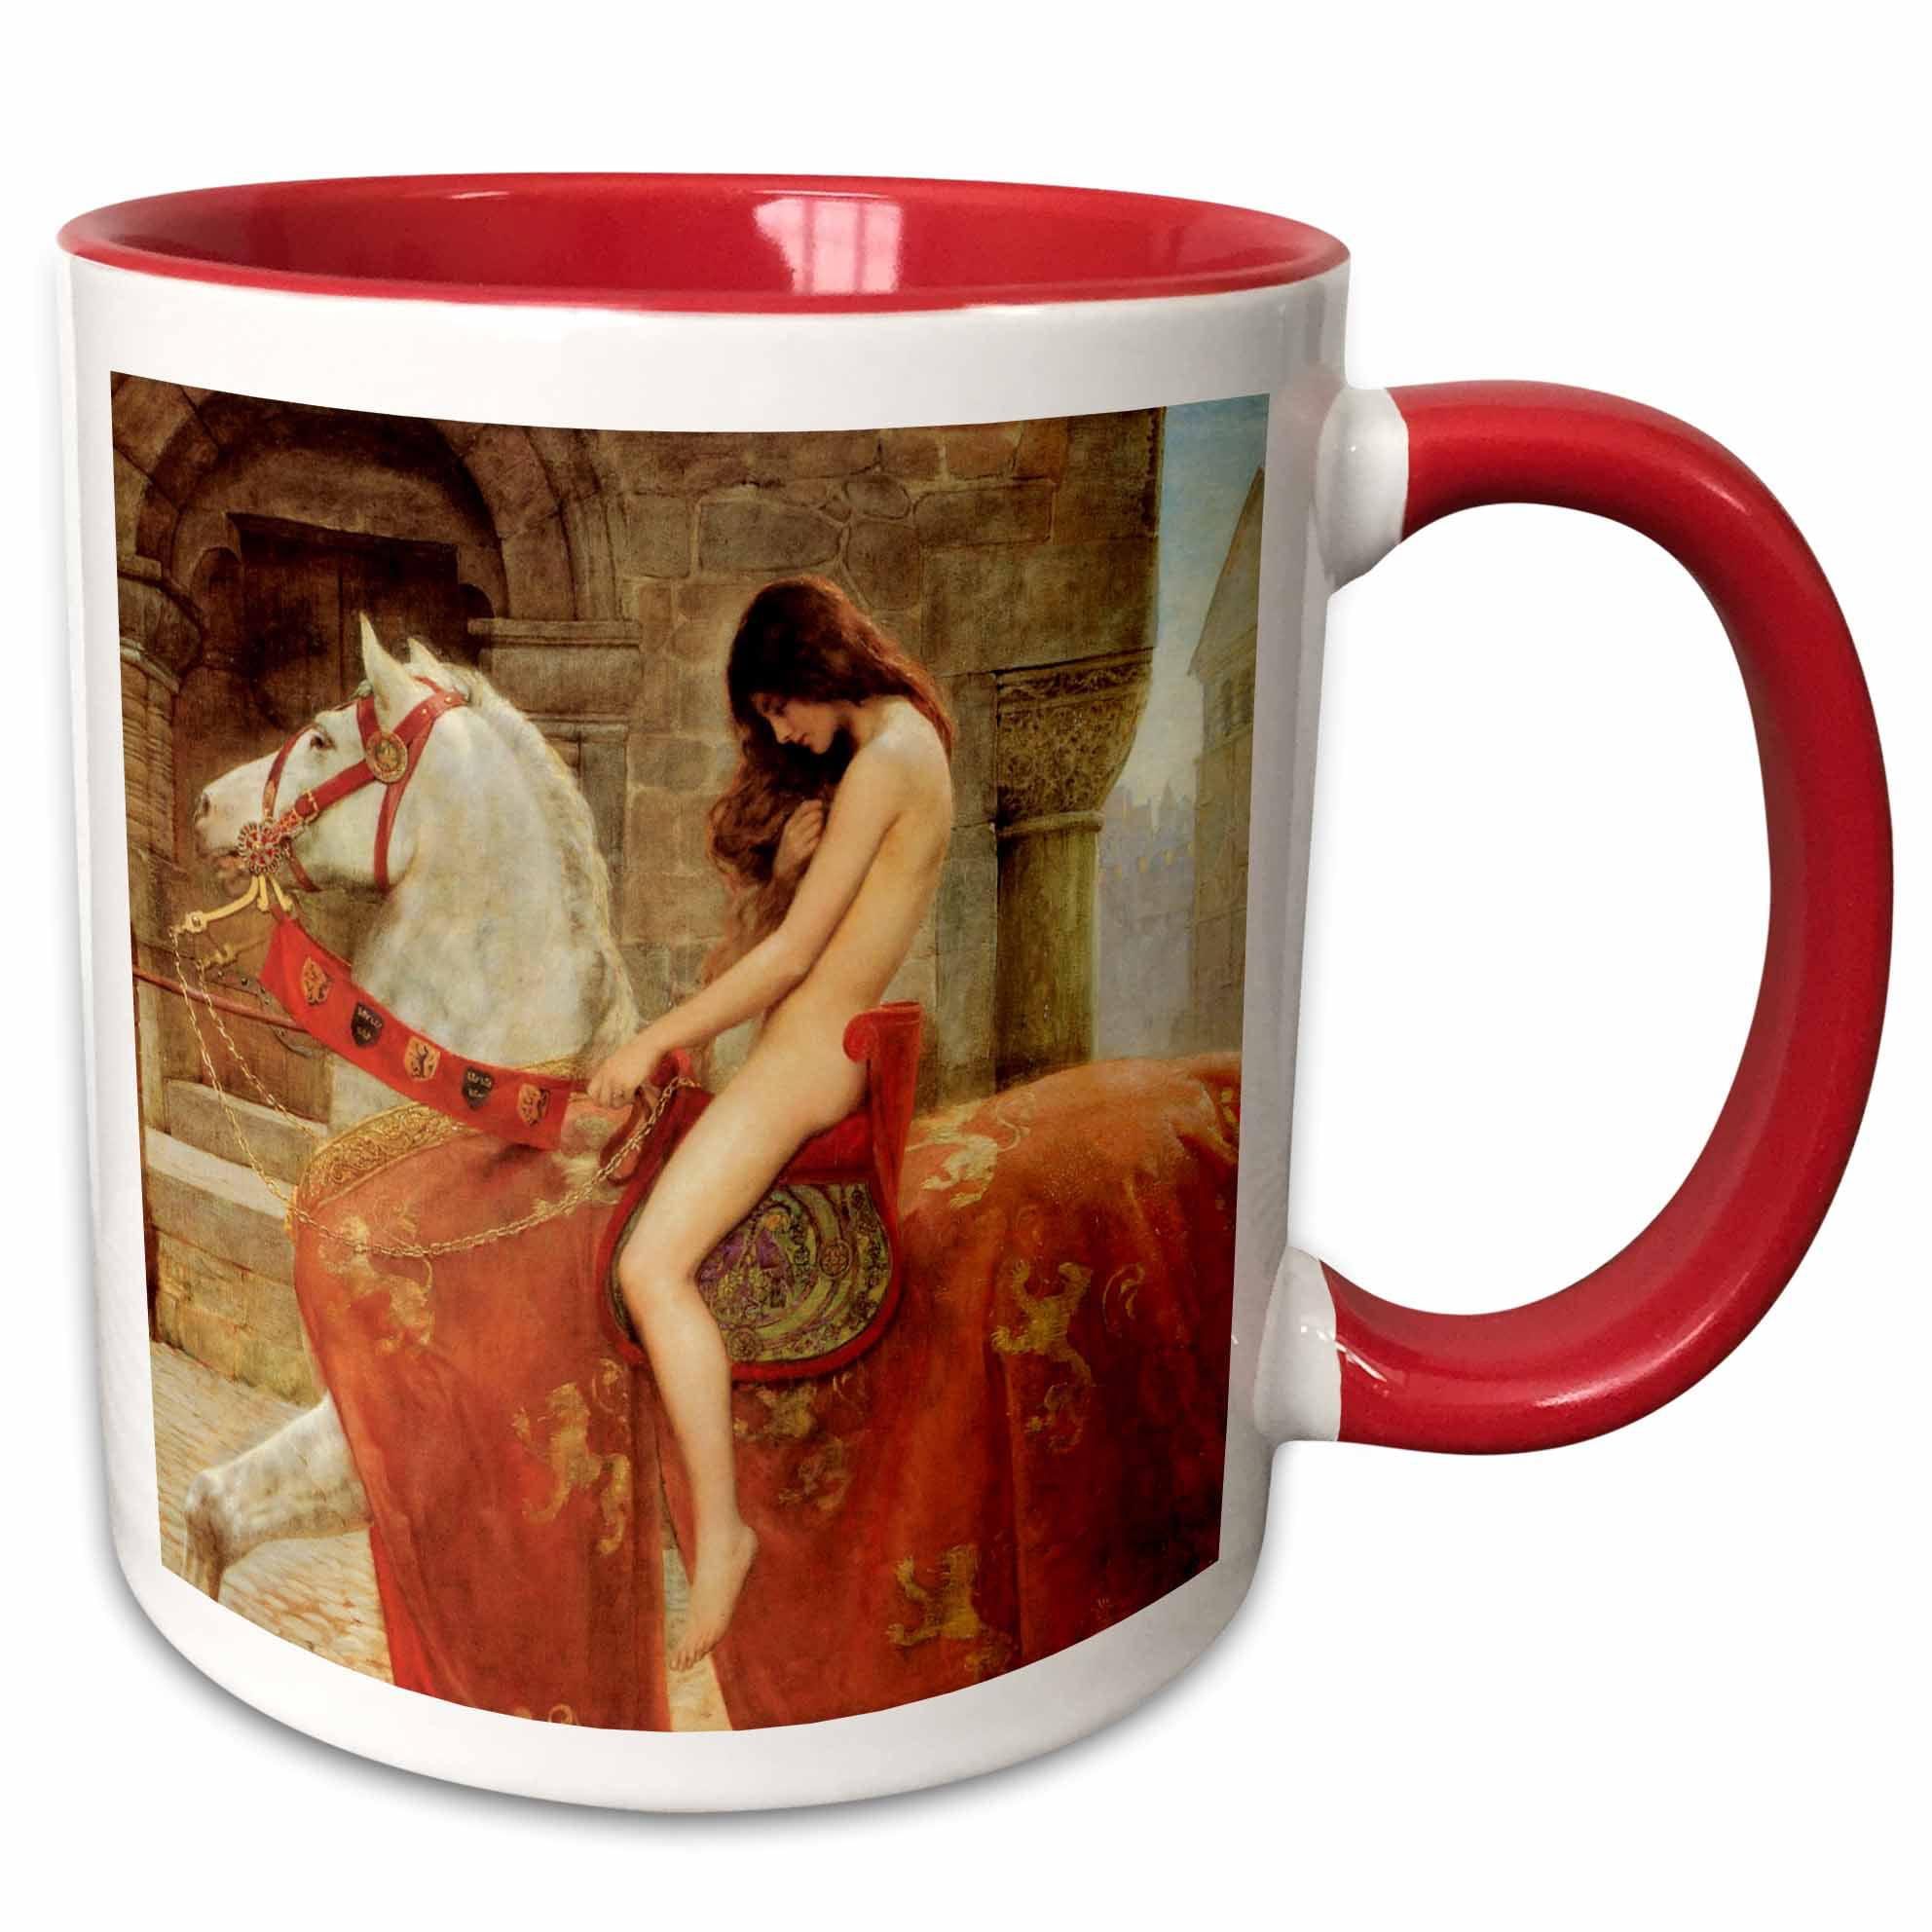 3drose Lady Godiva Vintage John Collier Two Tone Red Mug 11 Ounce Walmart Com Walmart Com